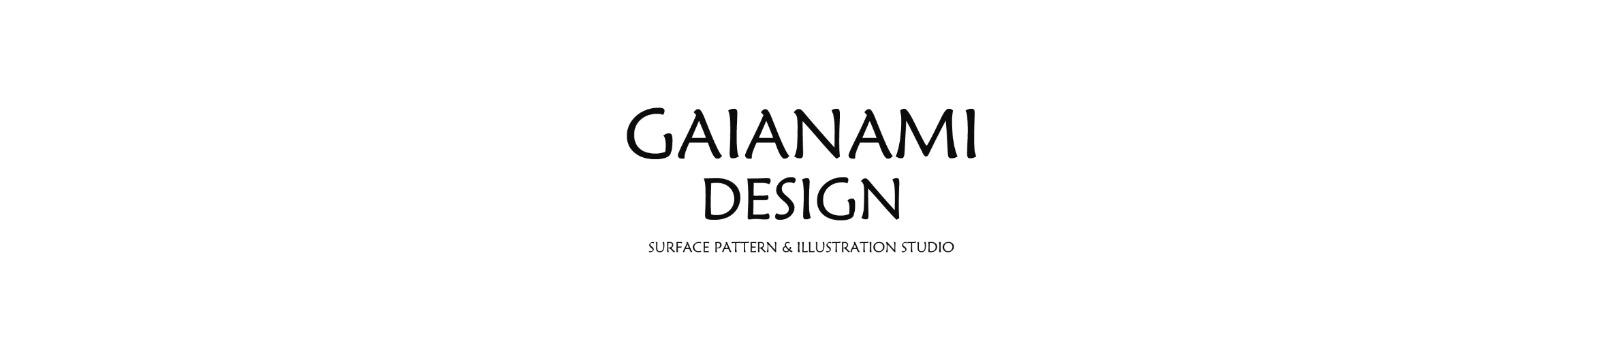 Surface Pattern Design Studio